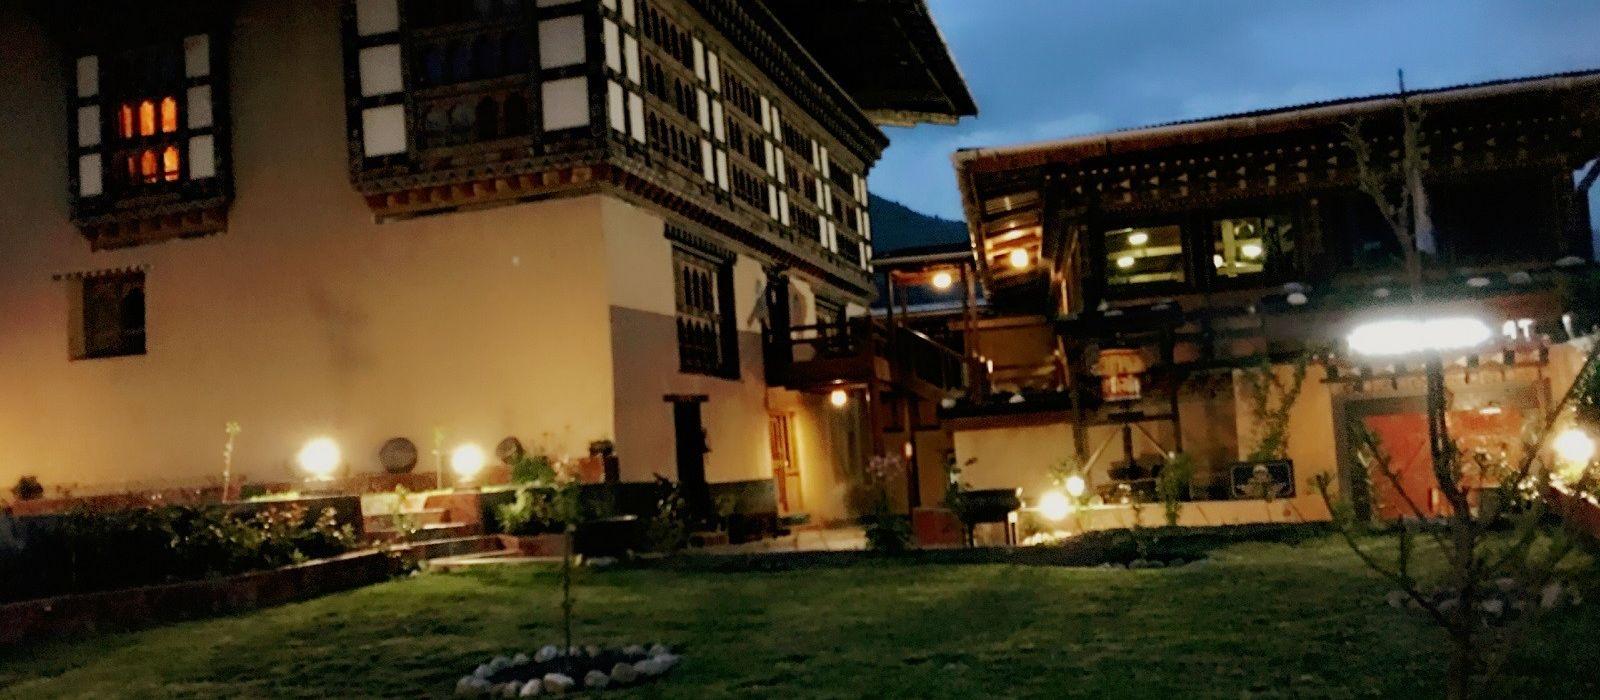 Hotel Soednam Zingkha Herigate Lodge Bhutan